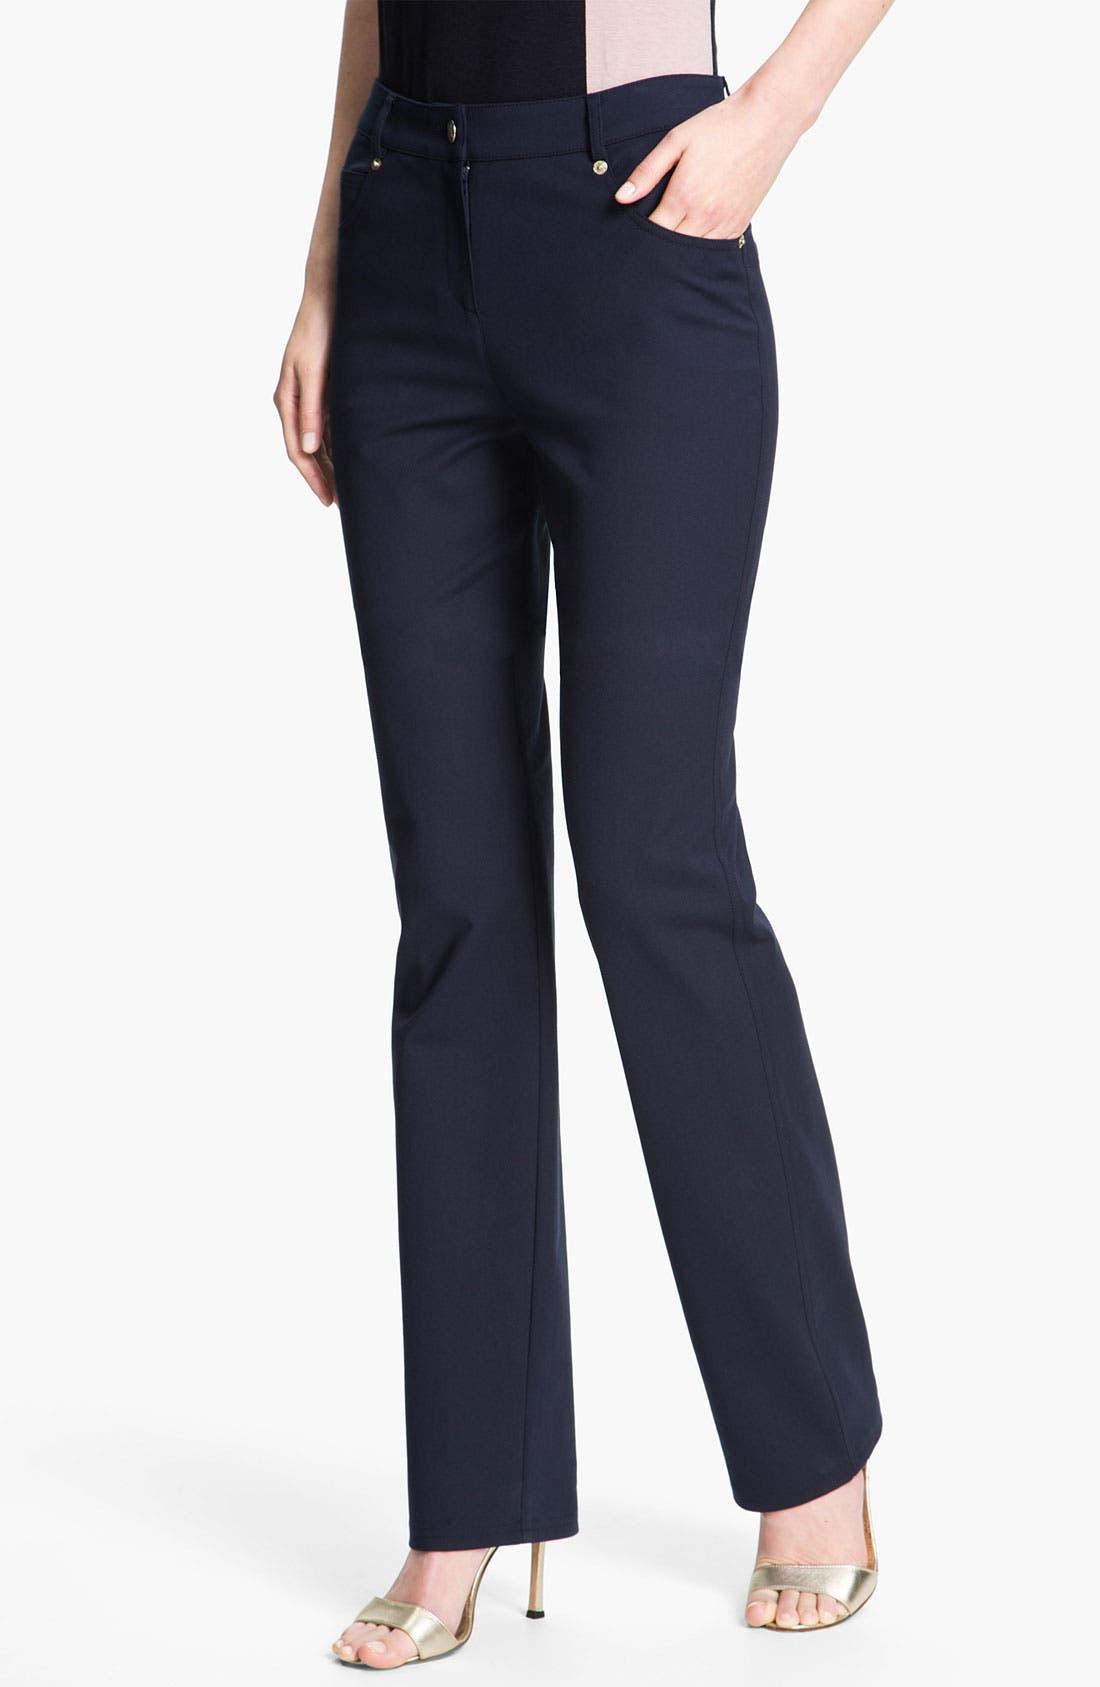 Alternate Image 1 Selected - St. John Yellow Label 'Marie' Five Pocket Straight Leg Pants